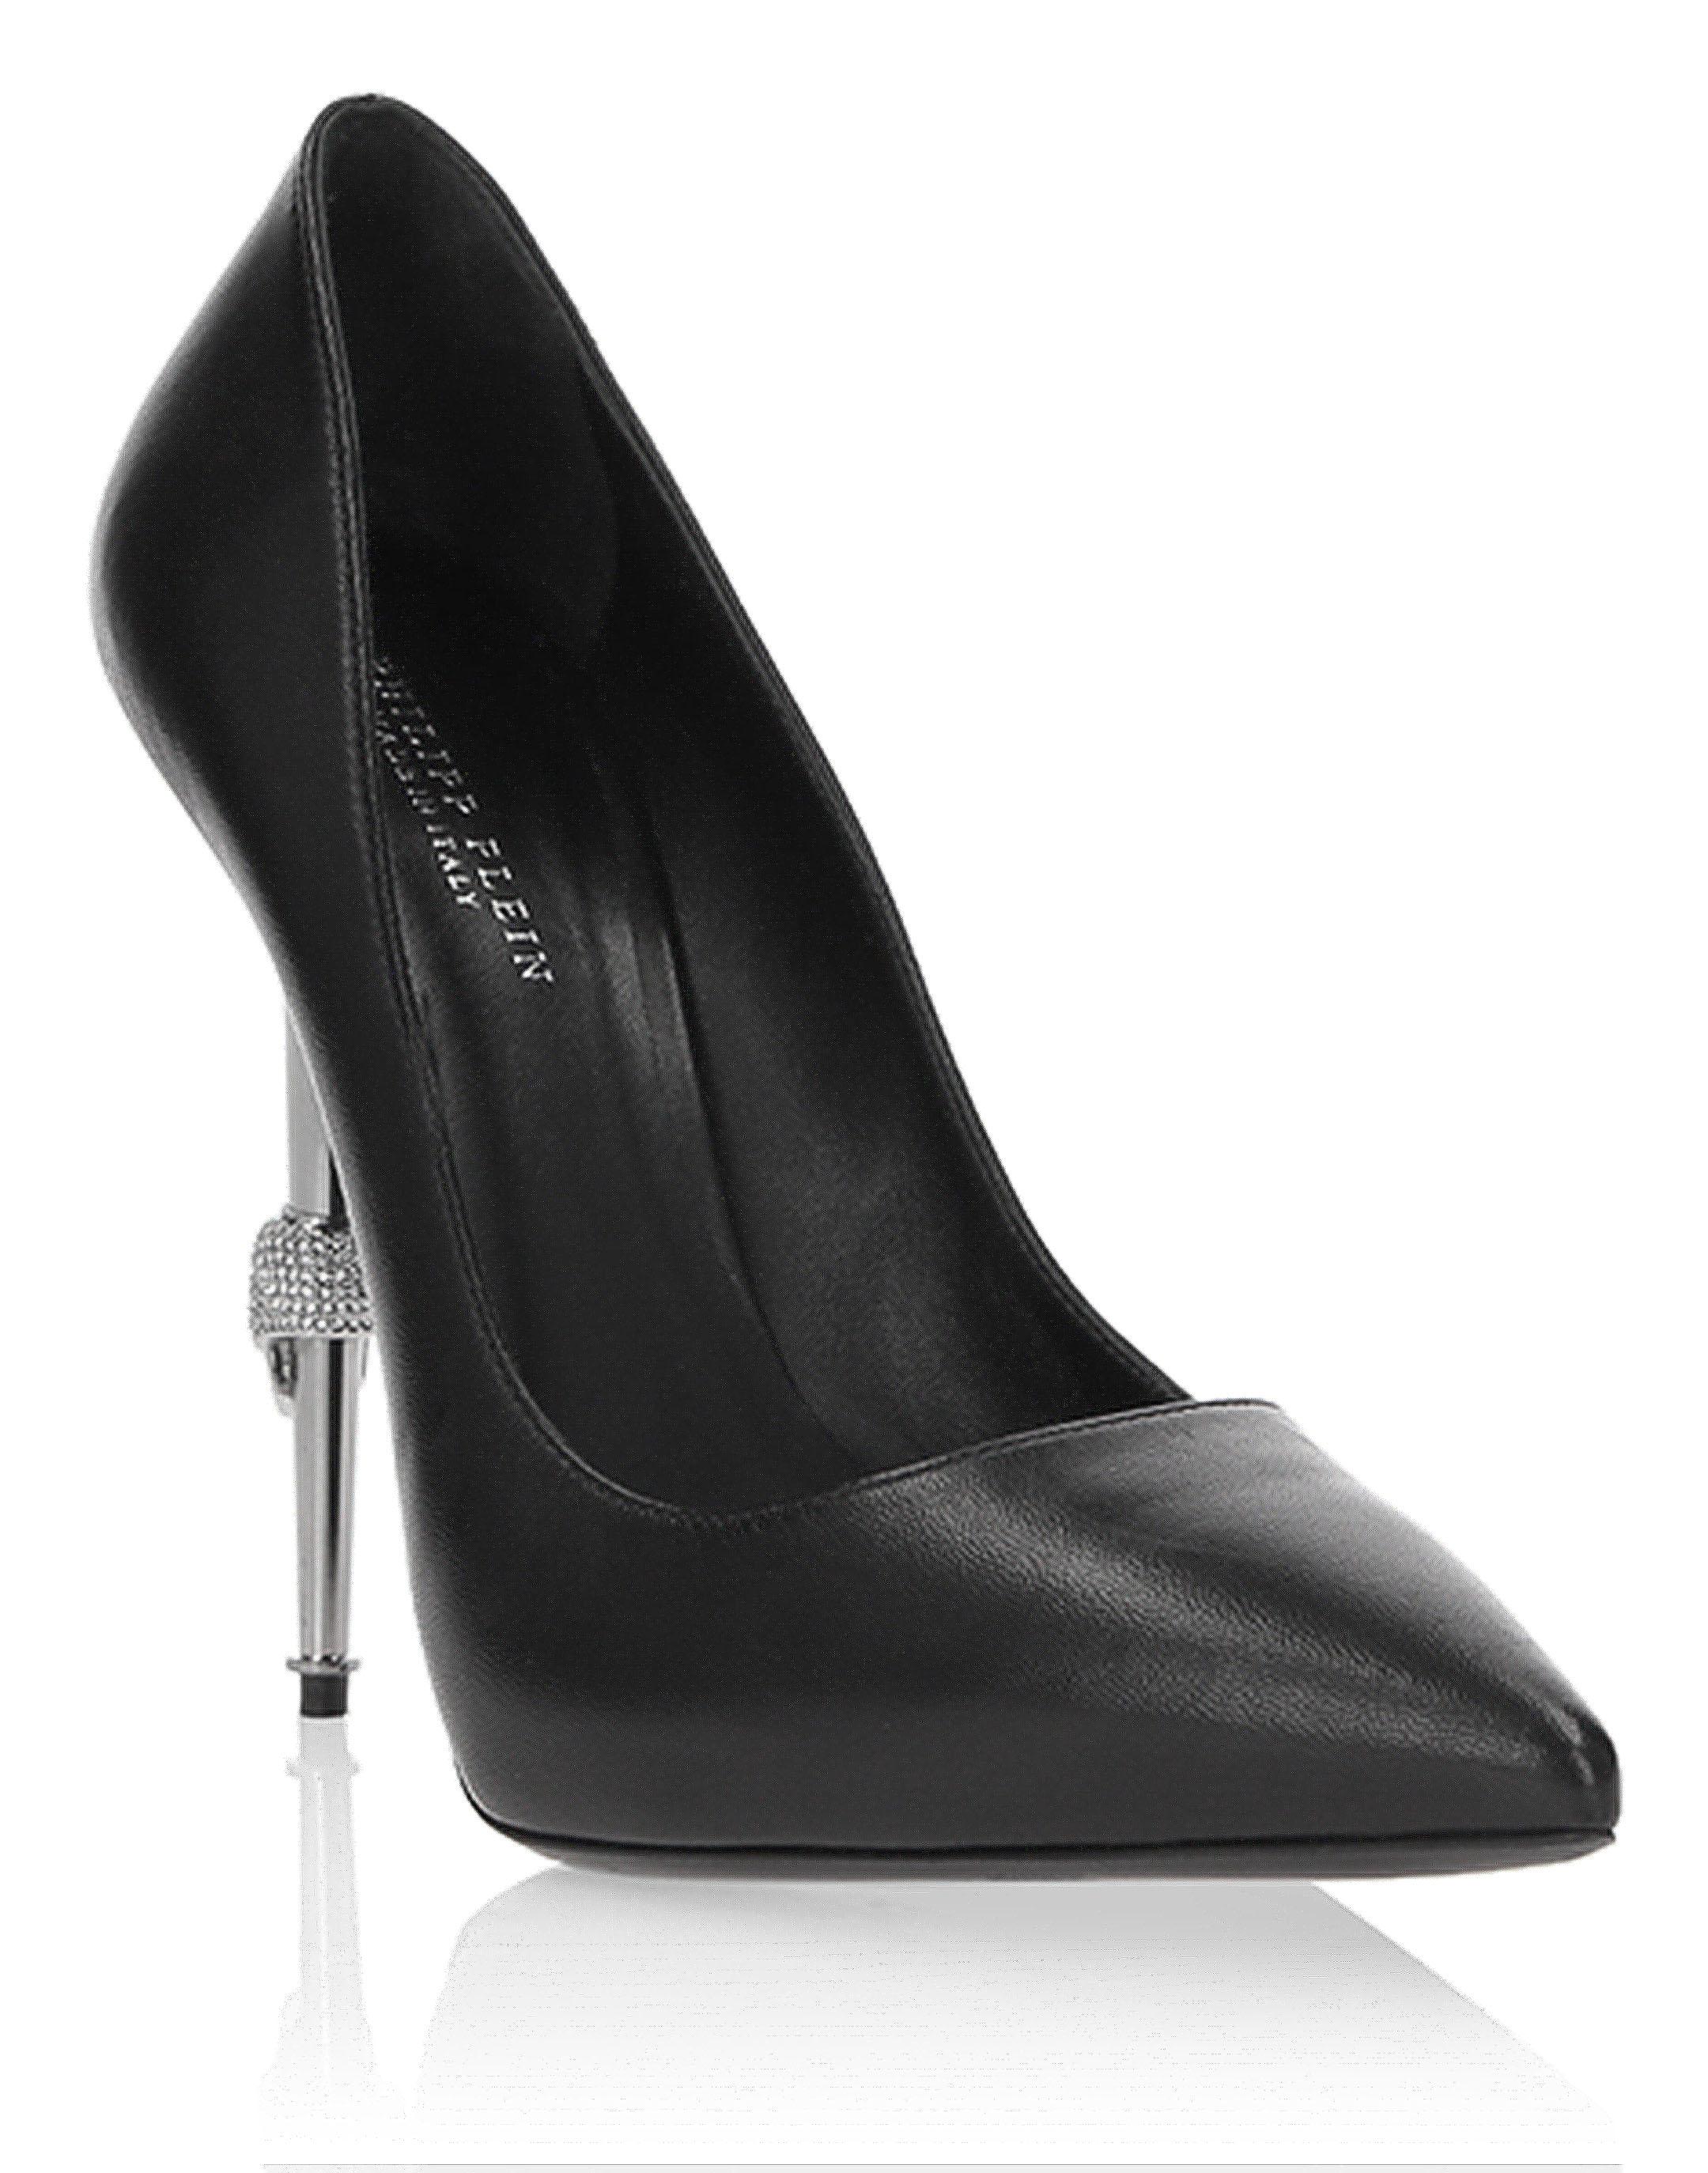 Decollete Hi-Heels Original in Nero from PHILIPP PLEIN